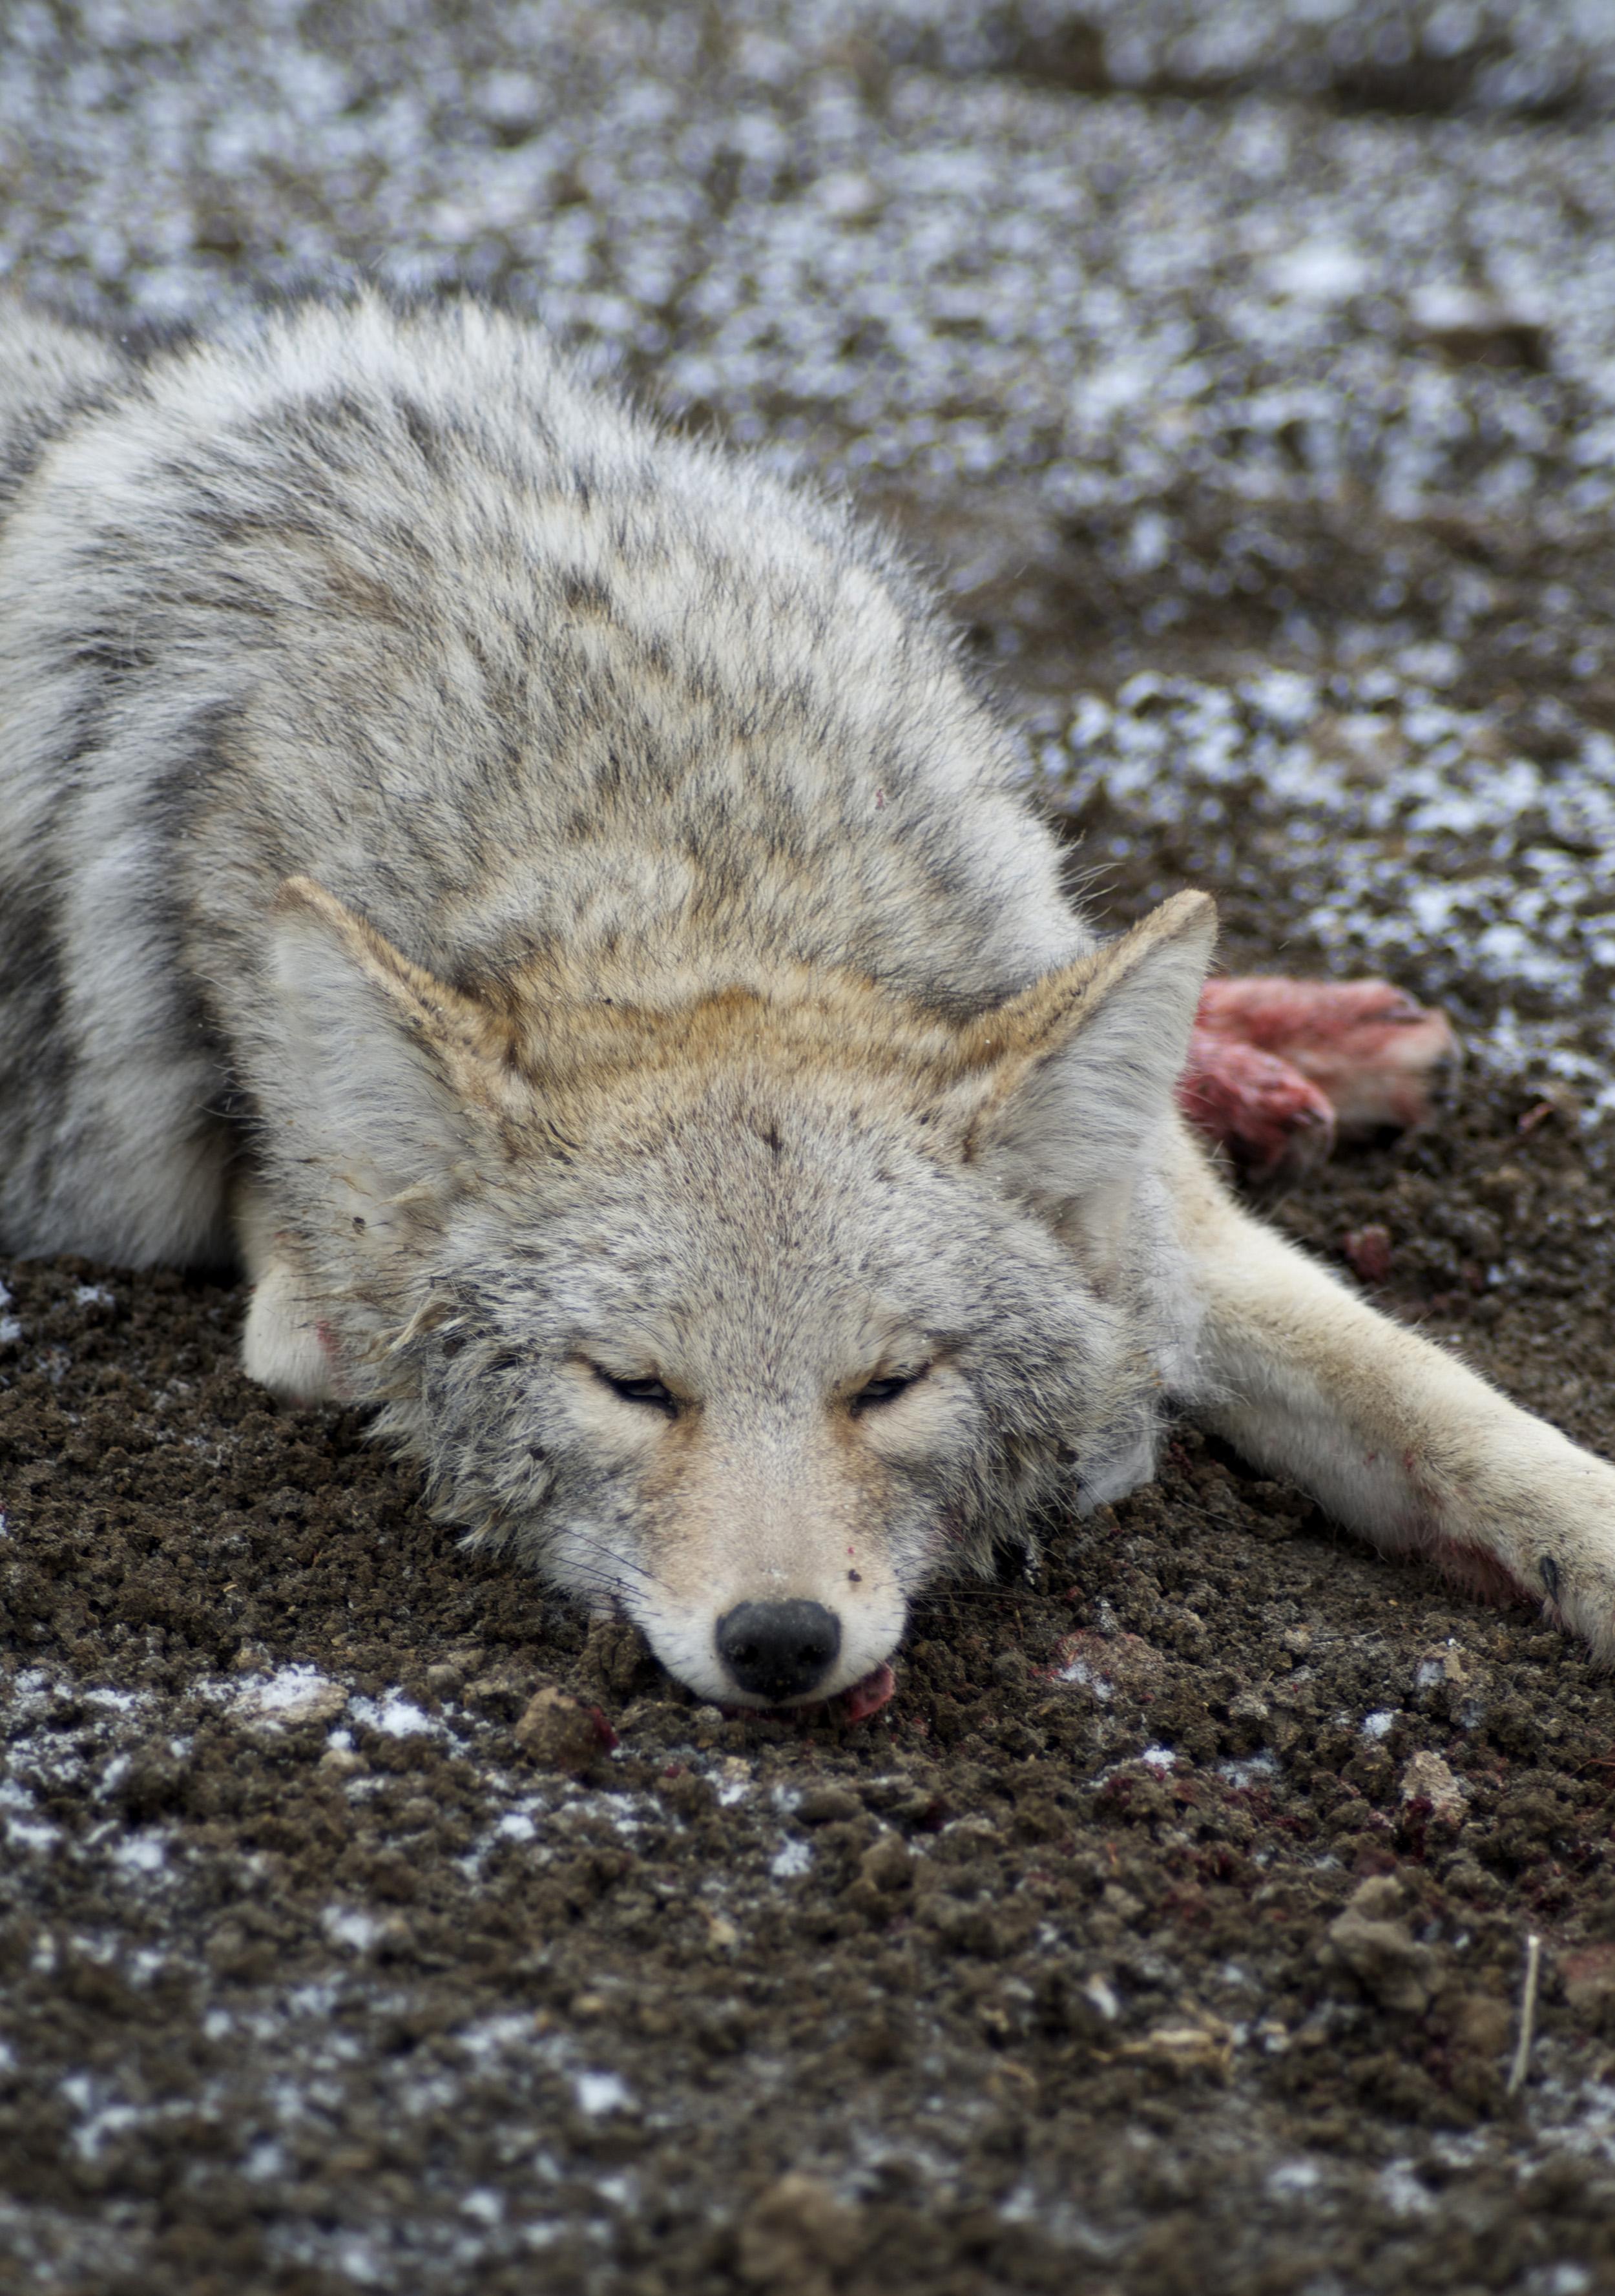 coyote hunting, Montana, Montana Wild, predator hunting, MT, calling, howling, distress calls, Primos, Nikon, Remington, Sitka